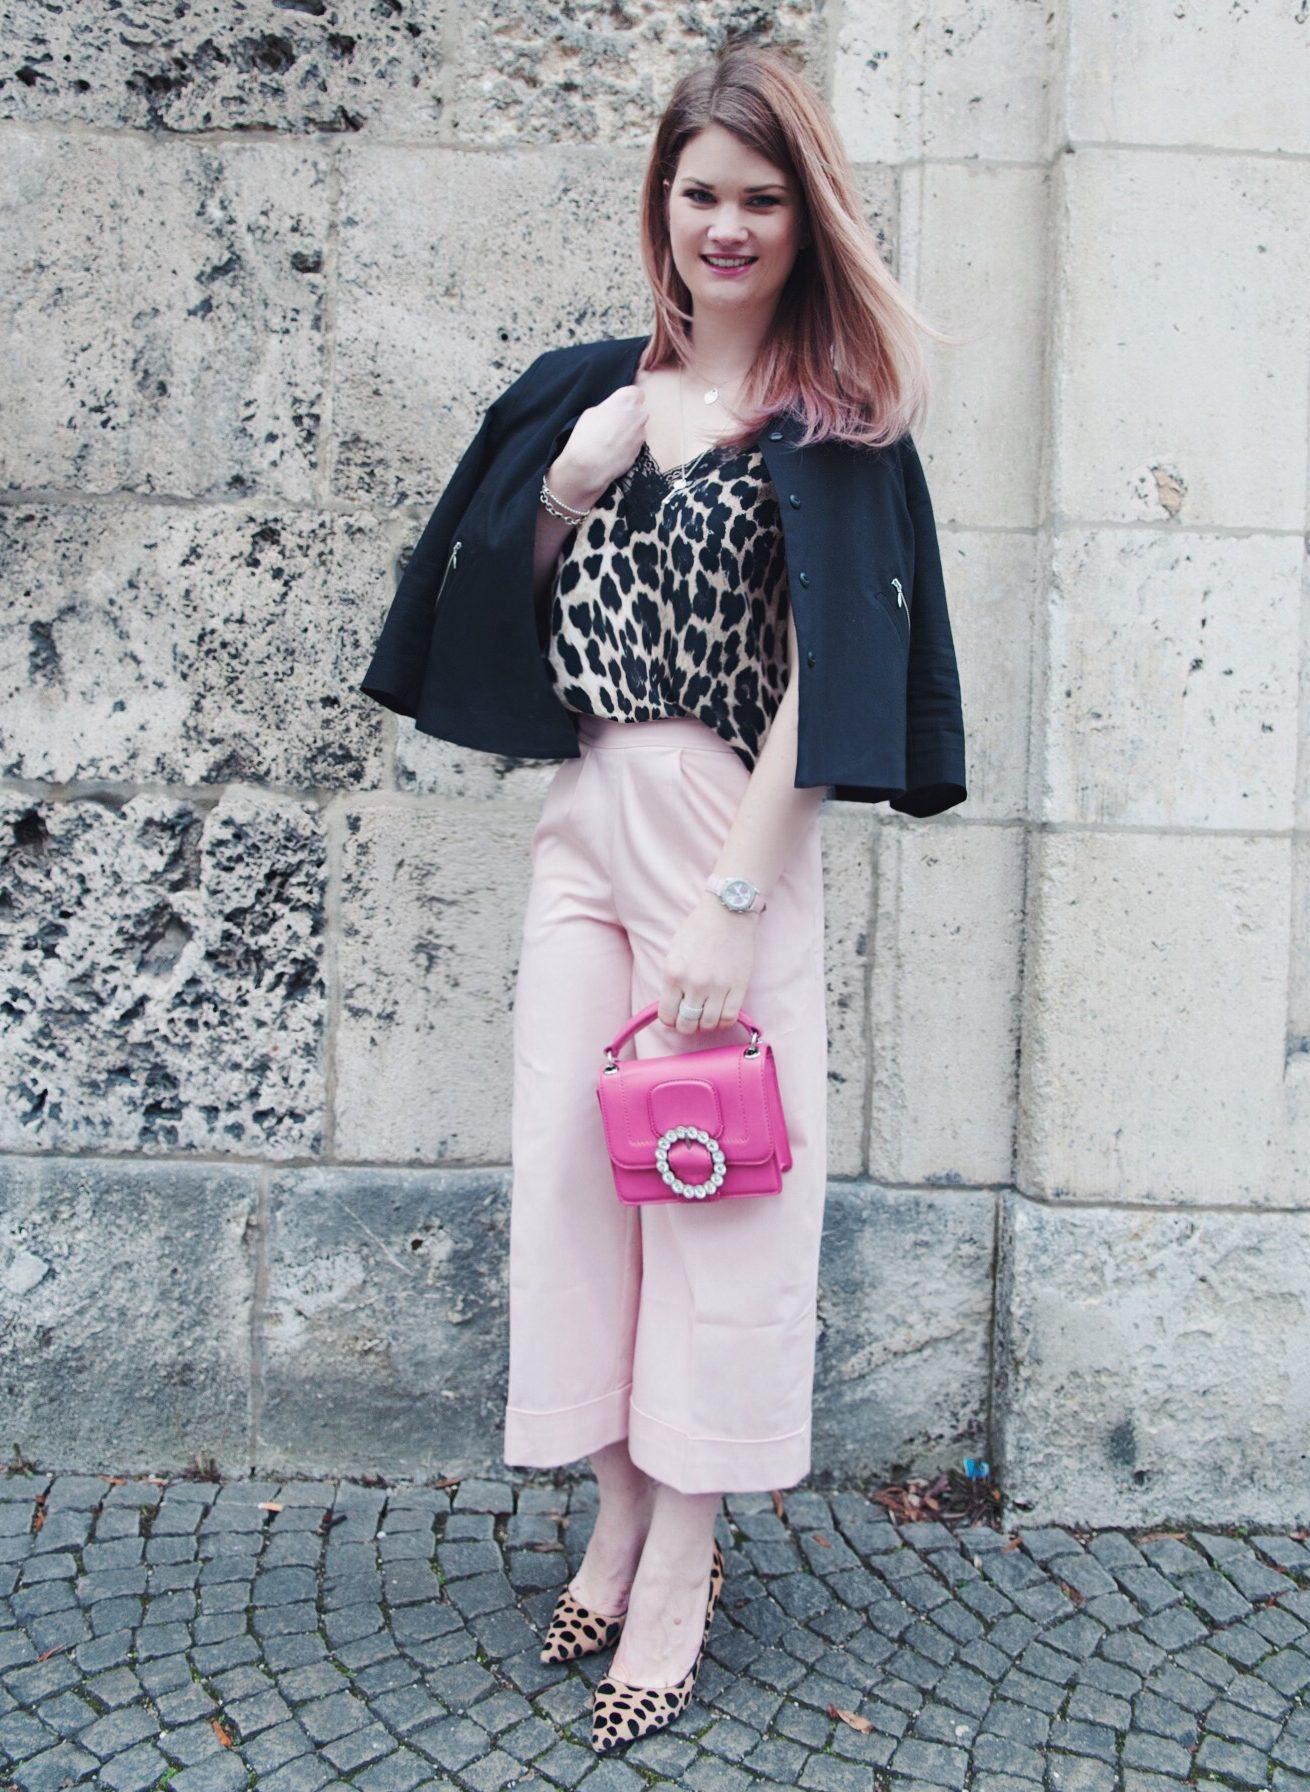 Marc Jacobs, Kolumne, Pink, Tasche, Pineapples and Pumps, Fashion Blog, Lifestyle, Muenchen, Munich, Tom Ford, Pumps, Jette Joop